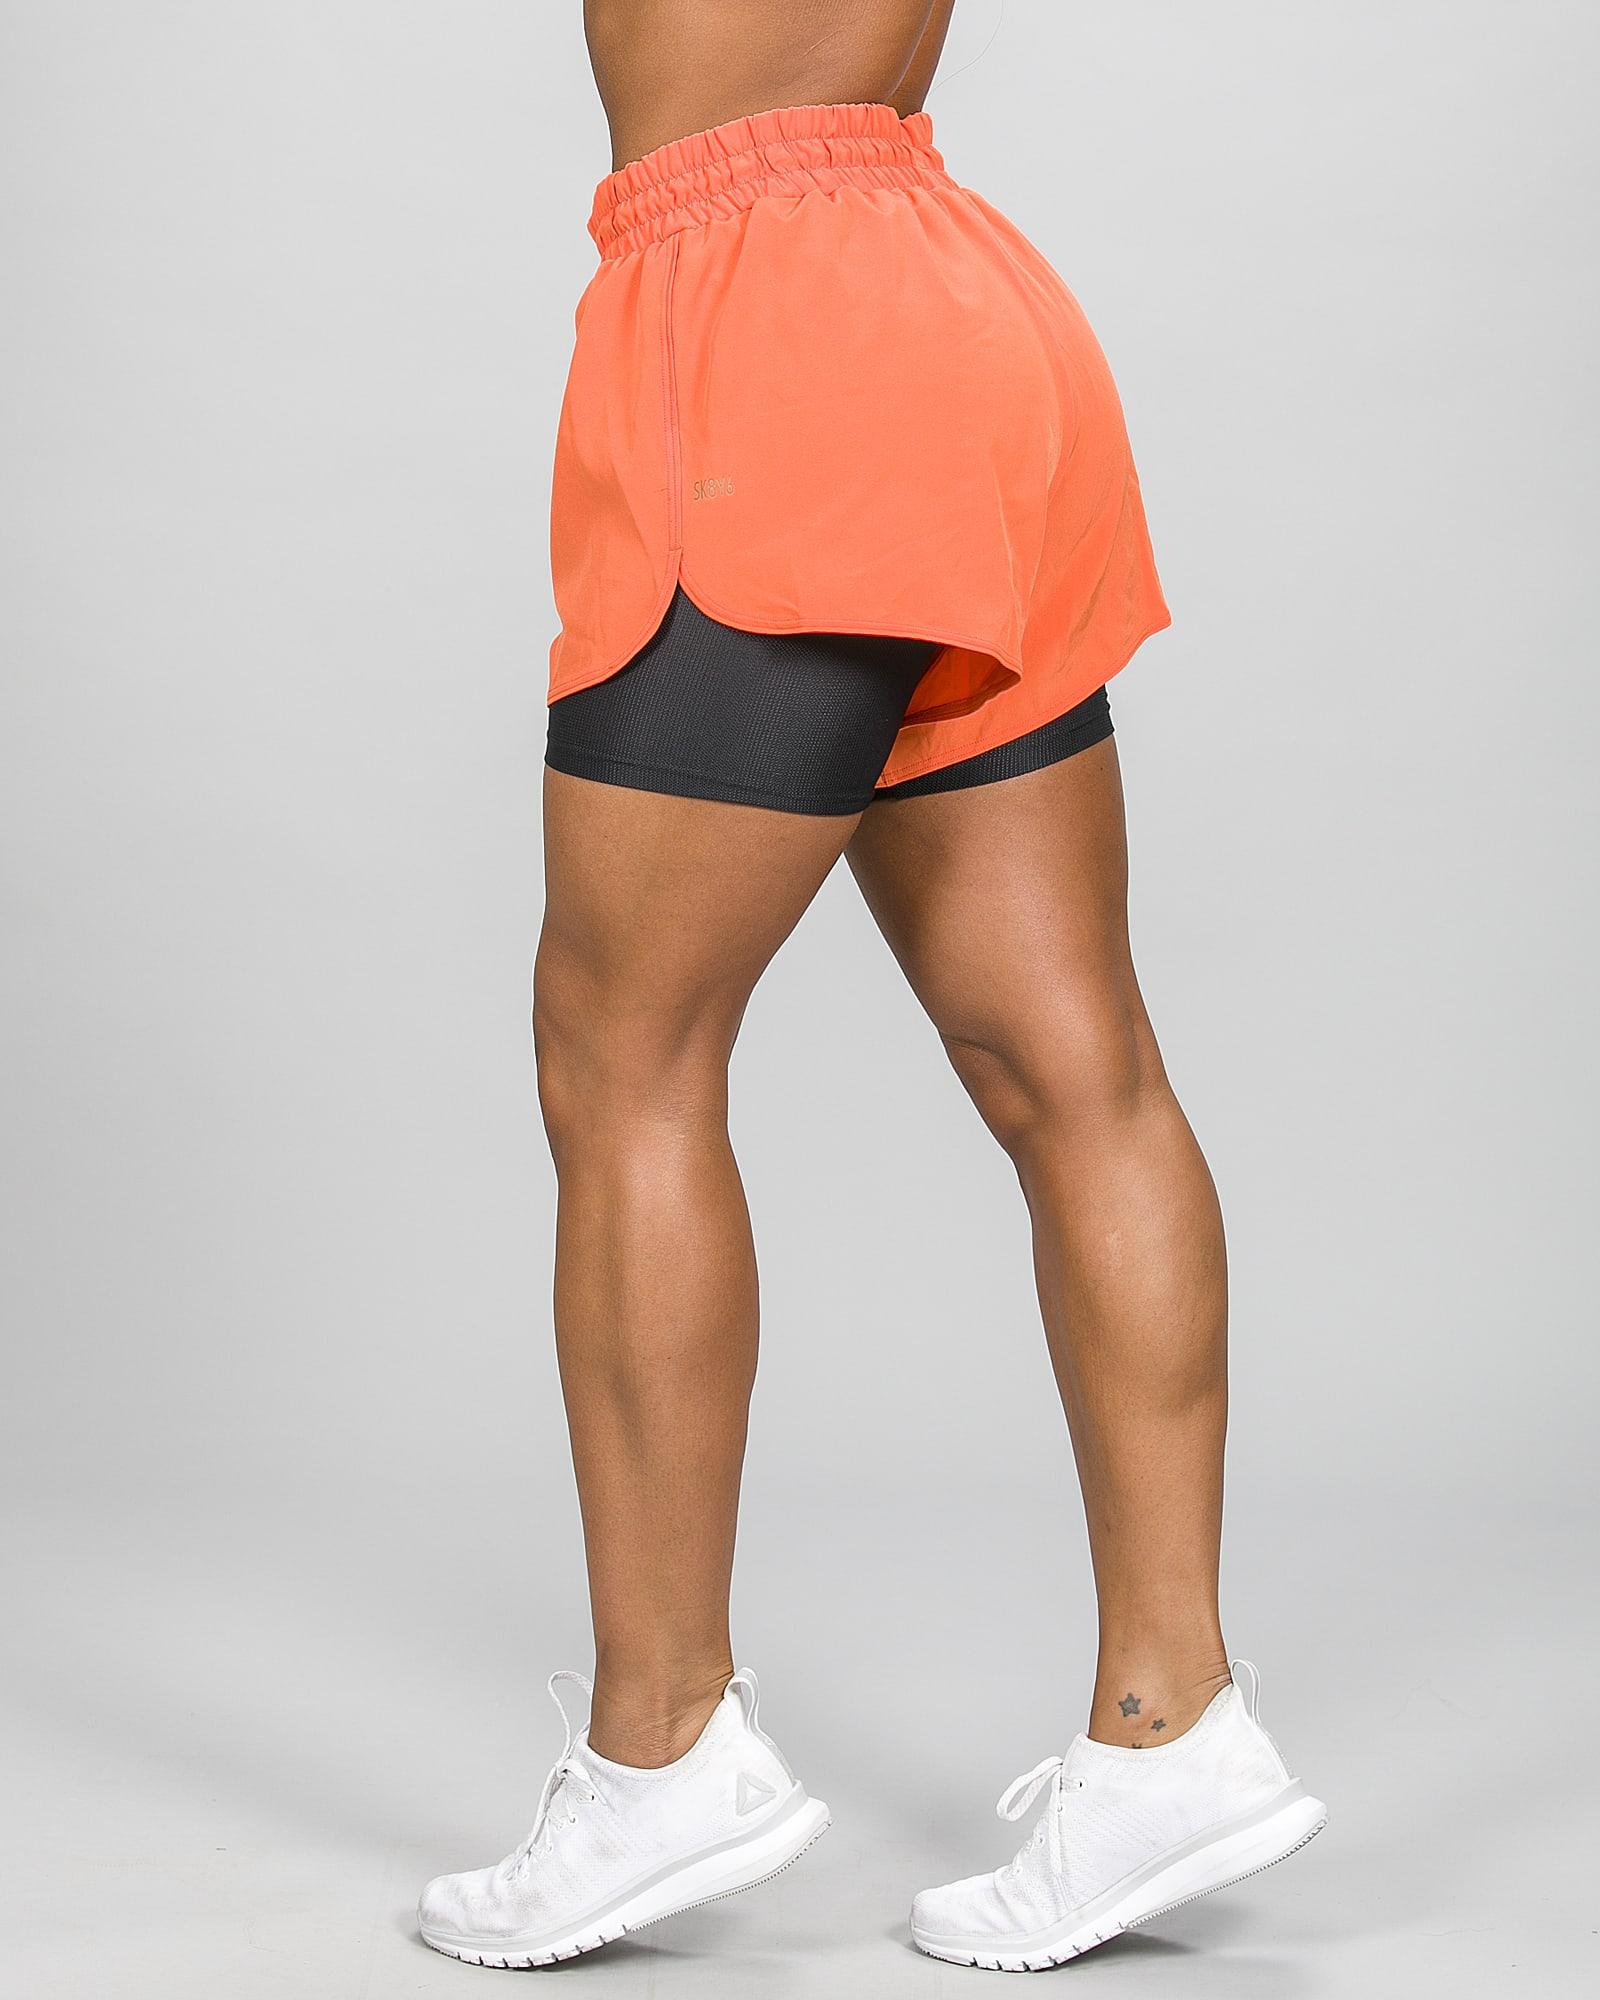 Skiny SK86 Shorts 083111- Blazing Orange c